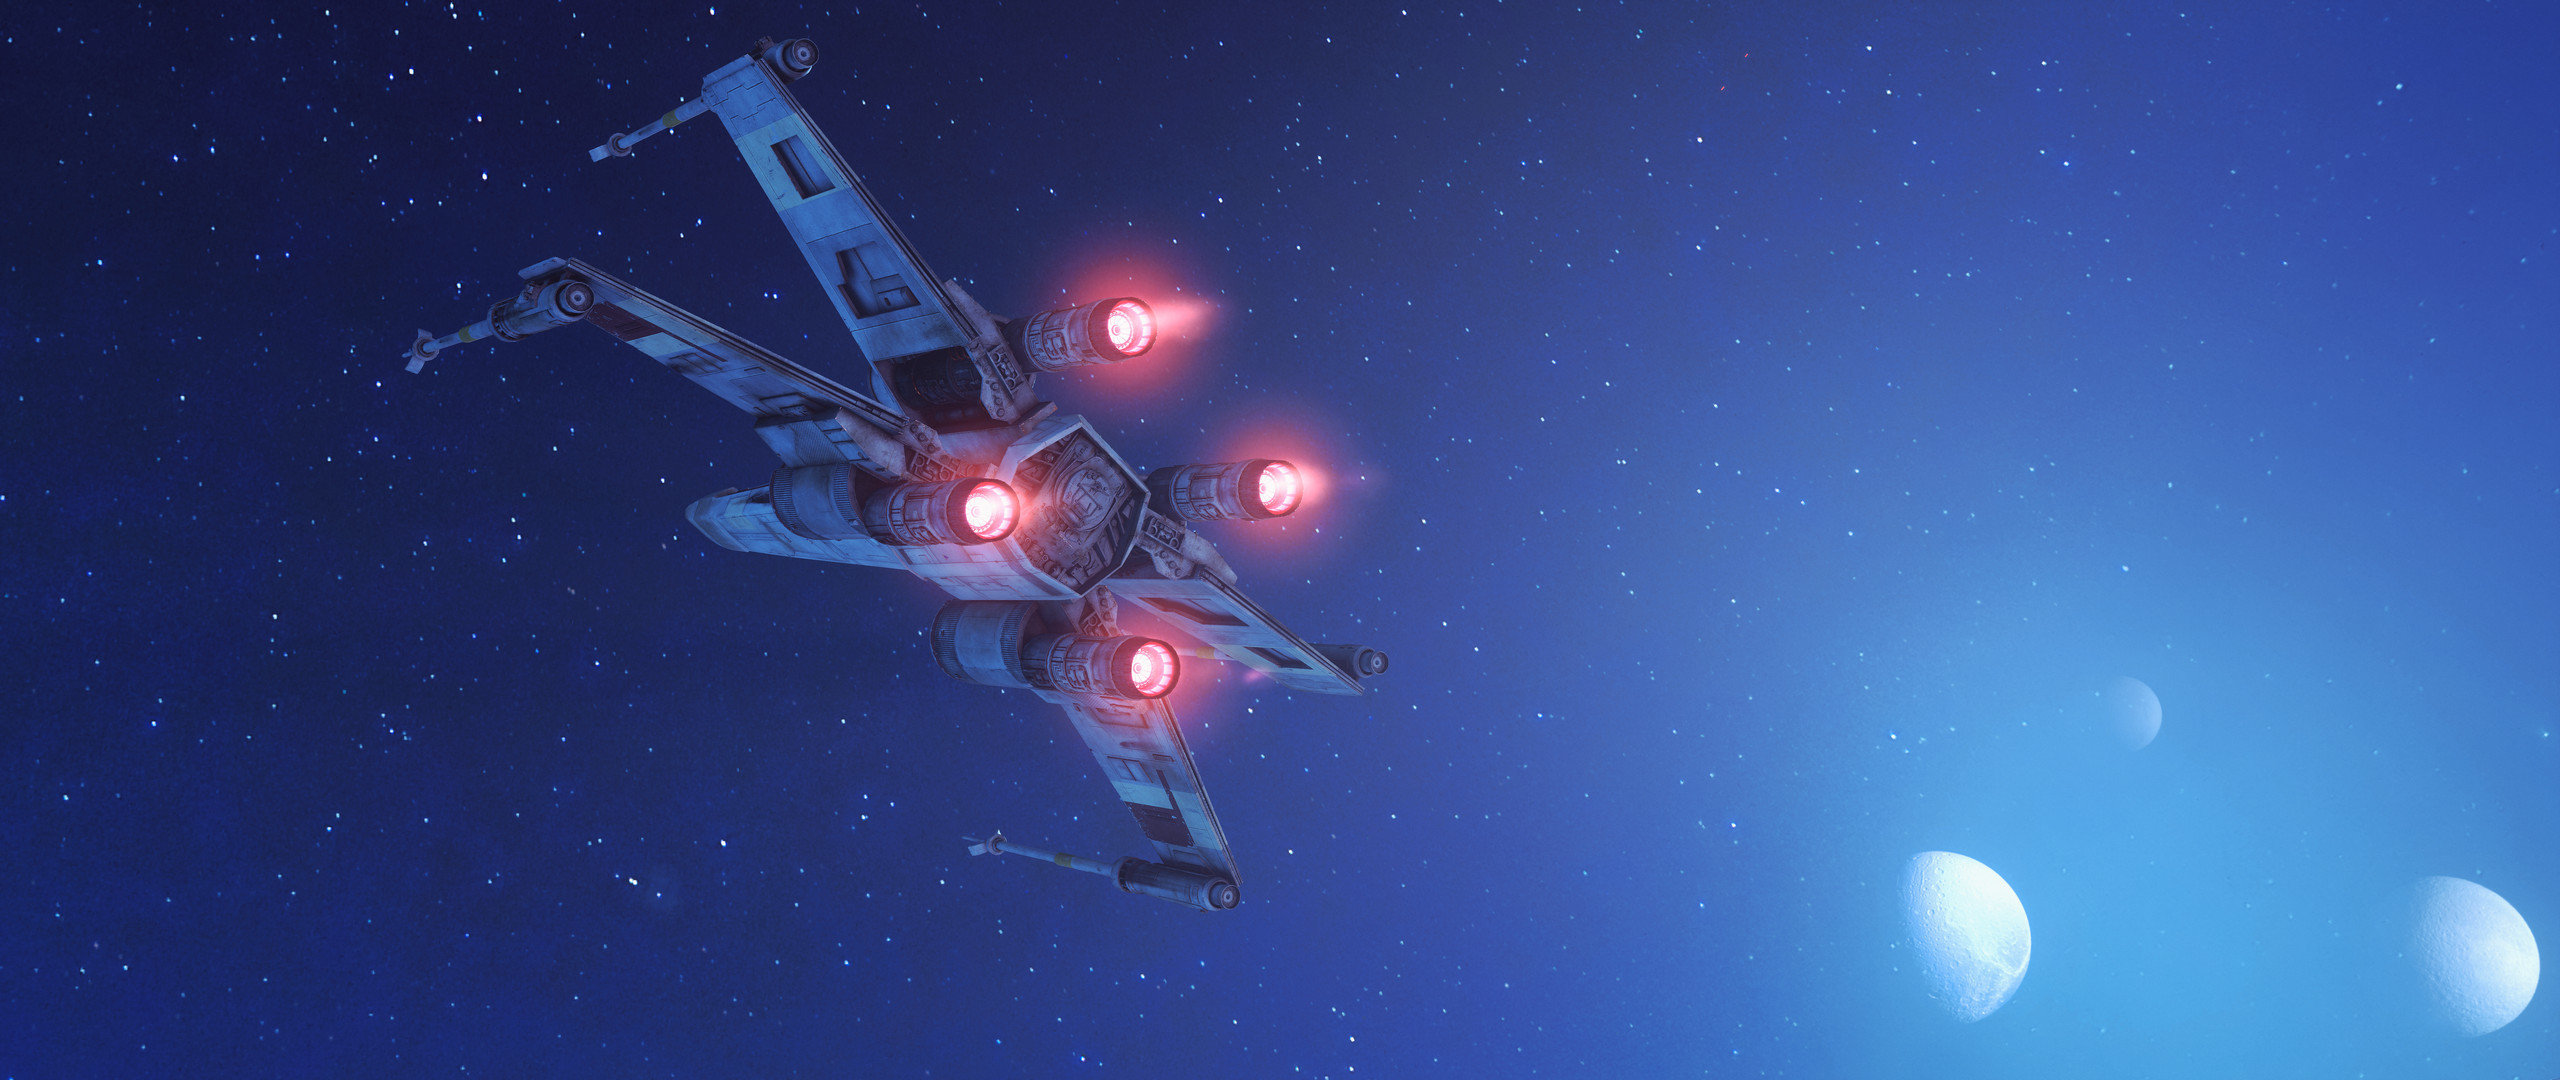 Video Game – Star Wars Battlefront (2015) X-Wing Wallpaper